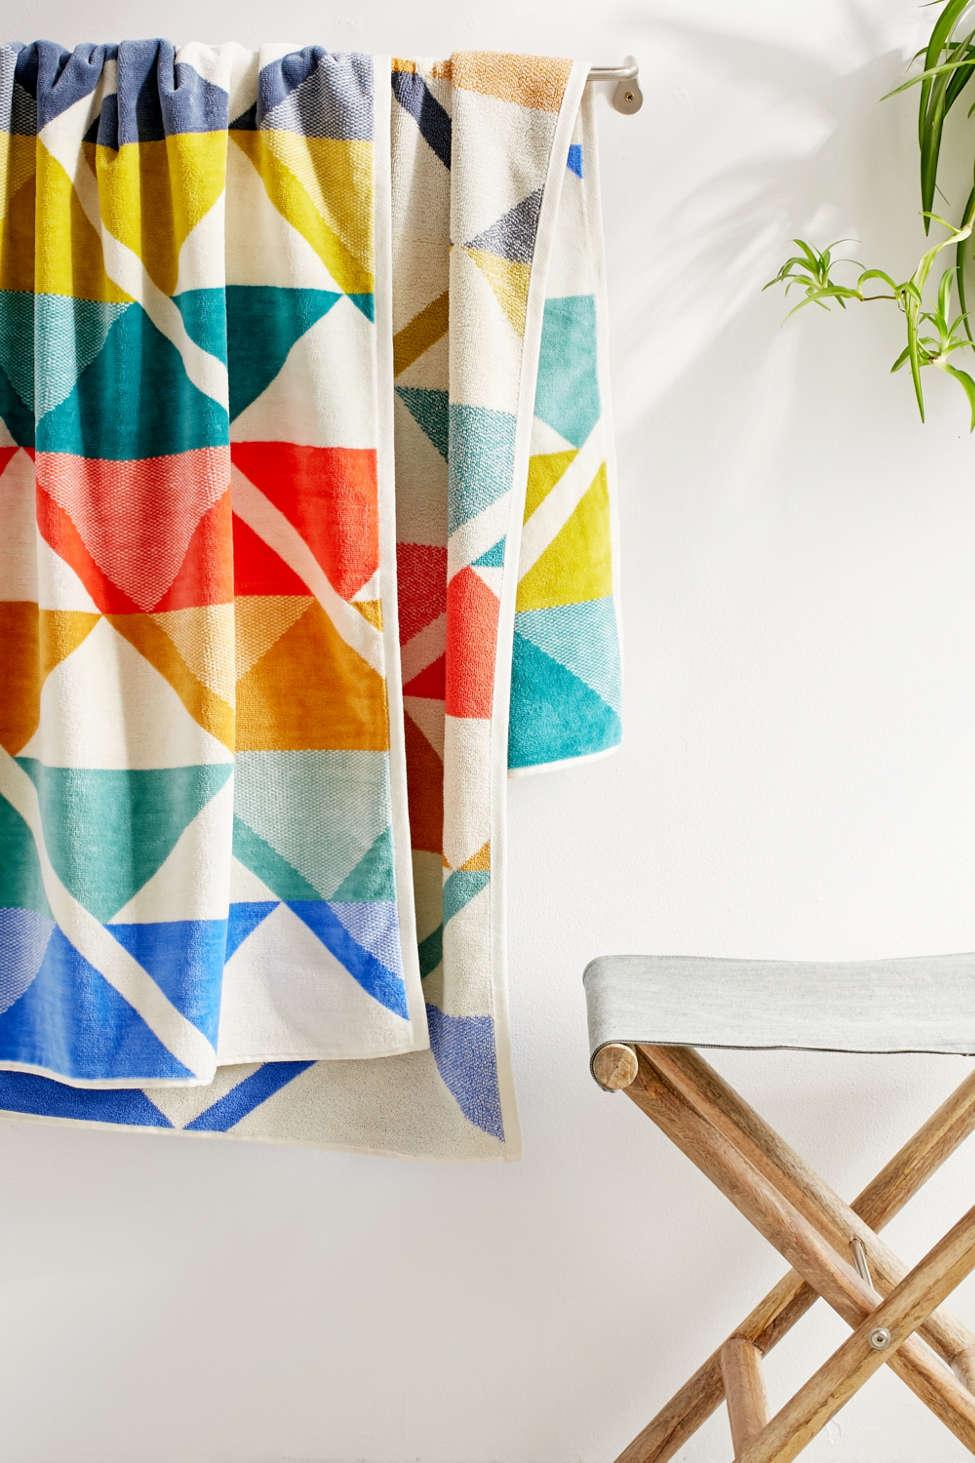 Slide View: 2: Pendleton Serrado Towel For Two Oversized Towel